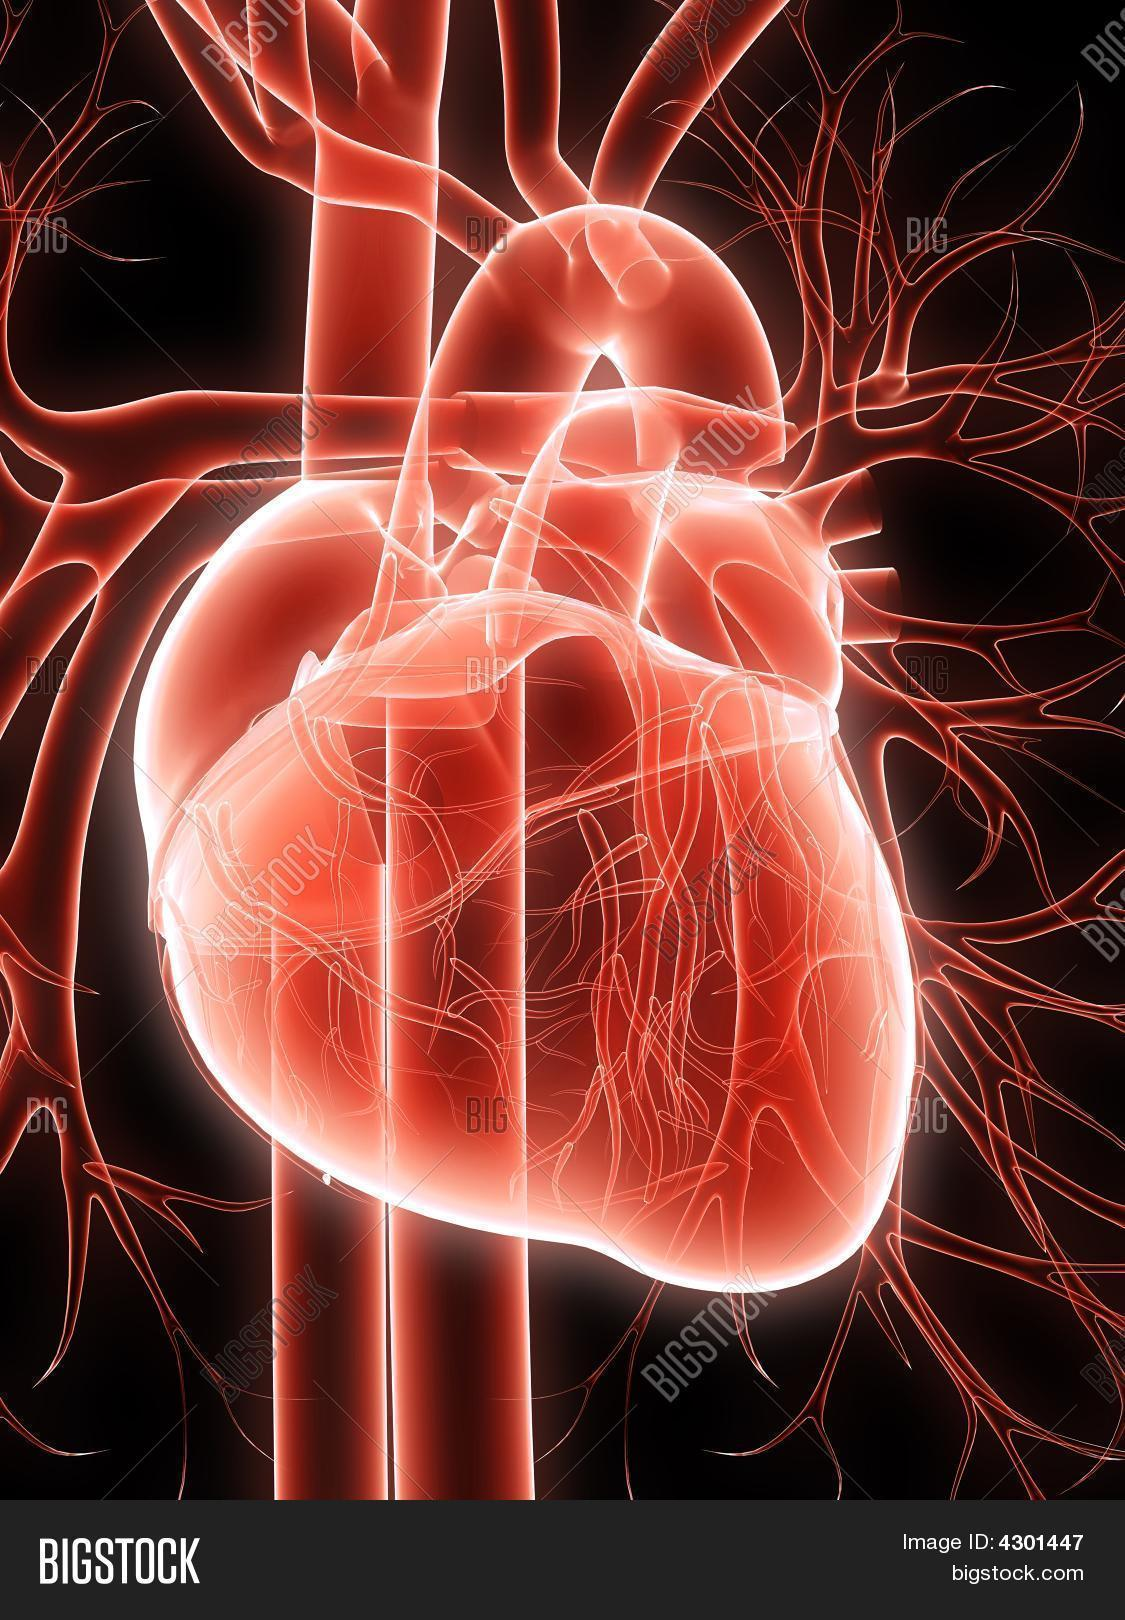 Human Heart Image Photo Free Trial Bigstock